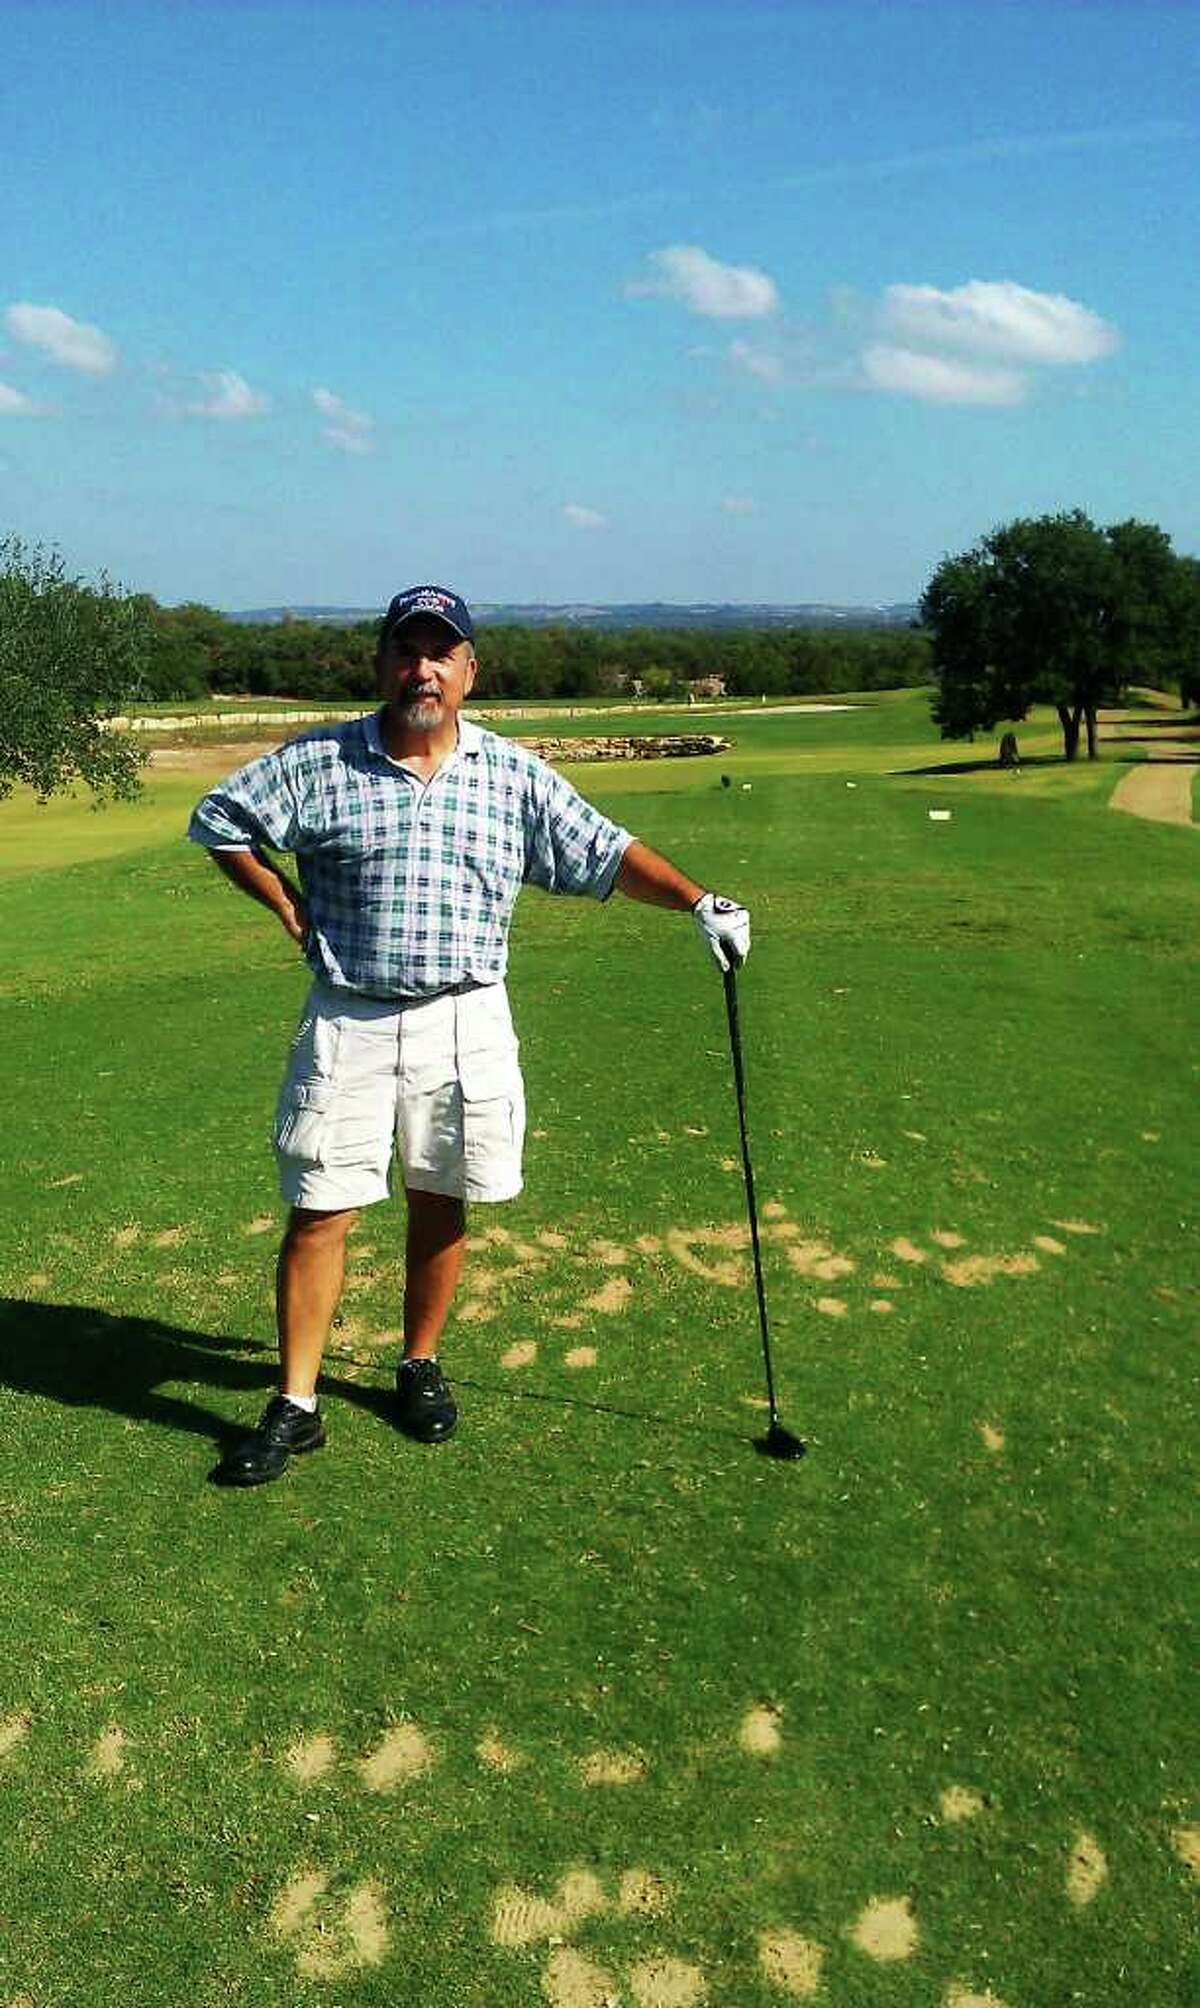 Bruce Muhlberg: No. 12 hole at Vaaler Creek, 167 yards, 7-wood, Sept. 2. First career ace.